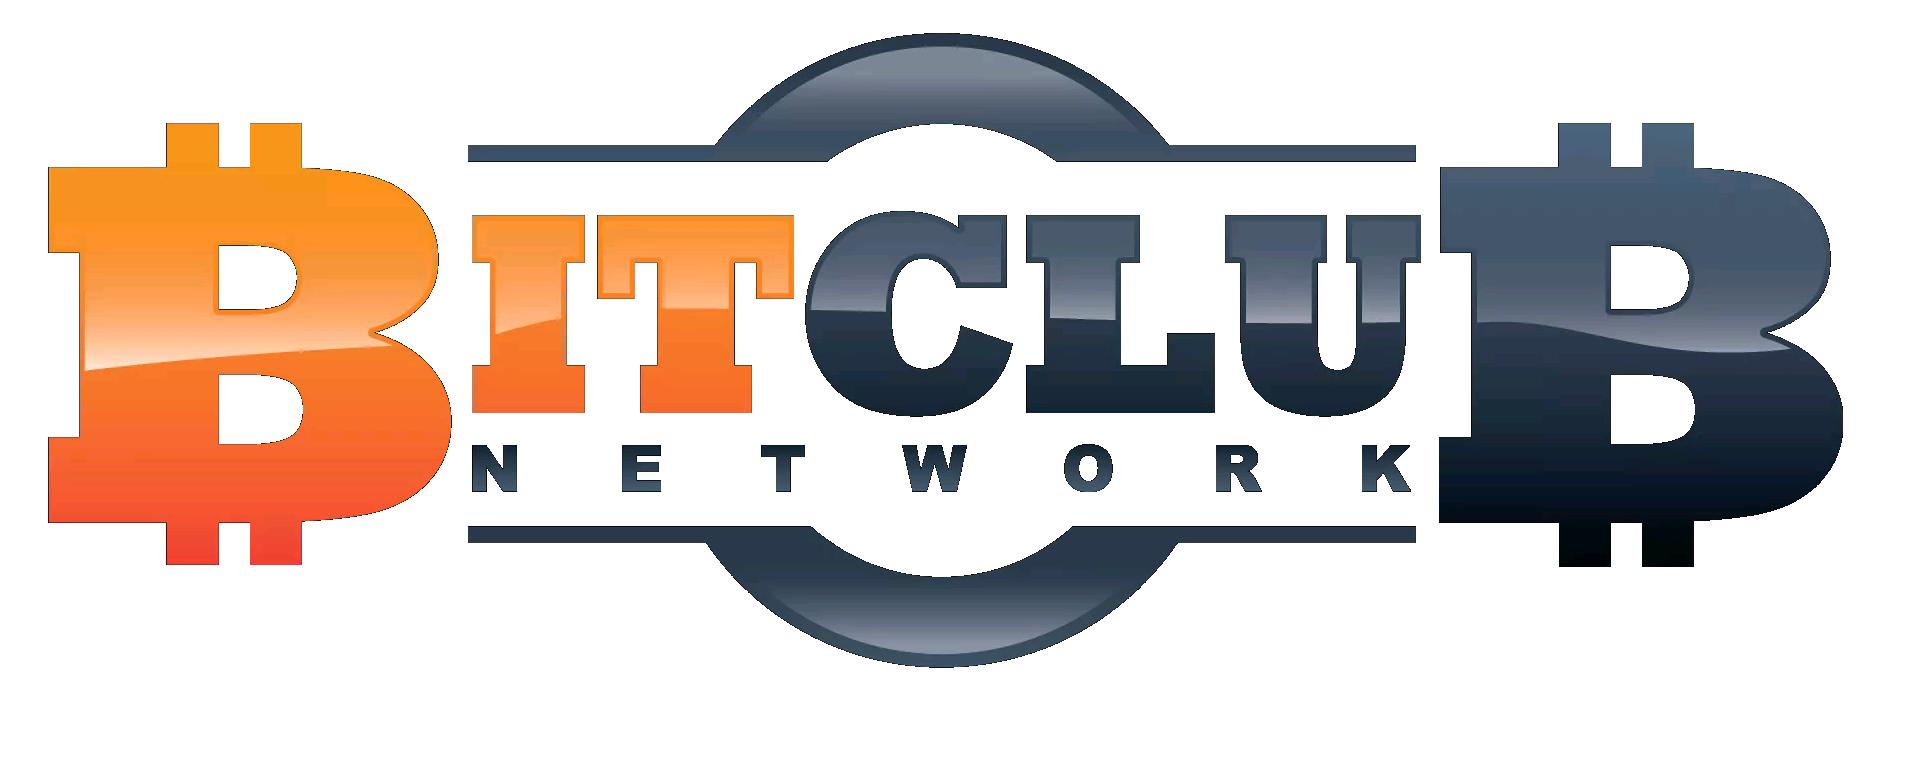 BitClub Network logosu